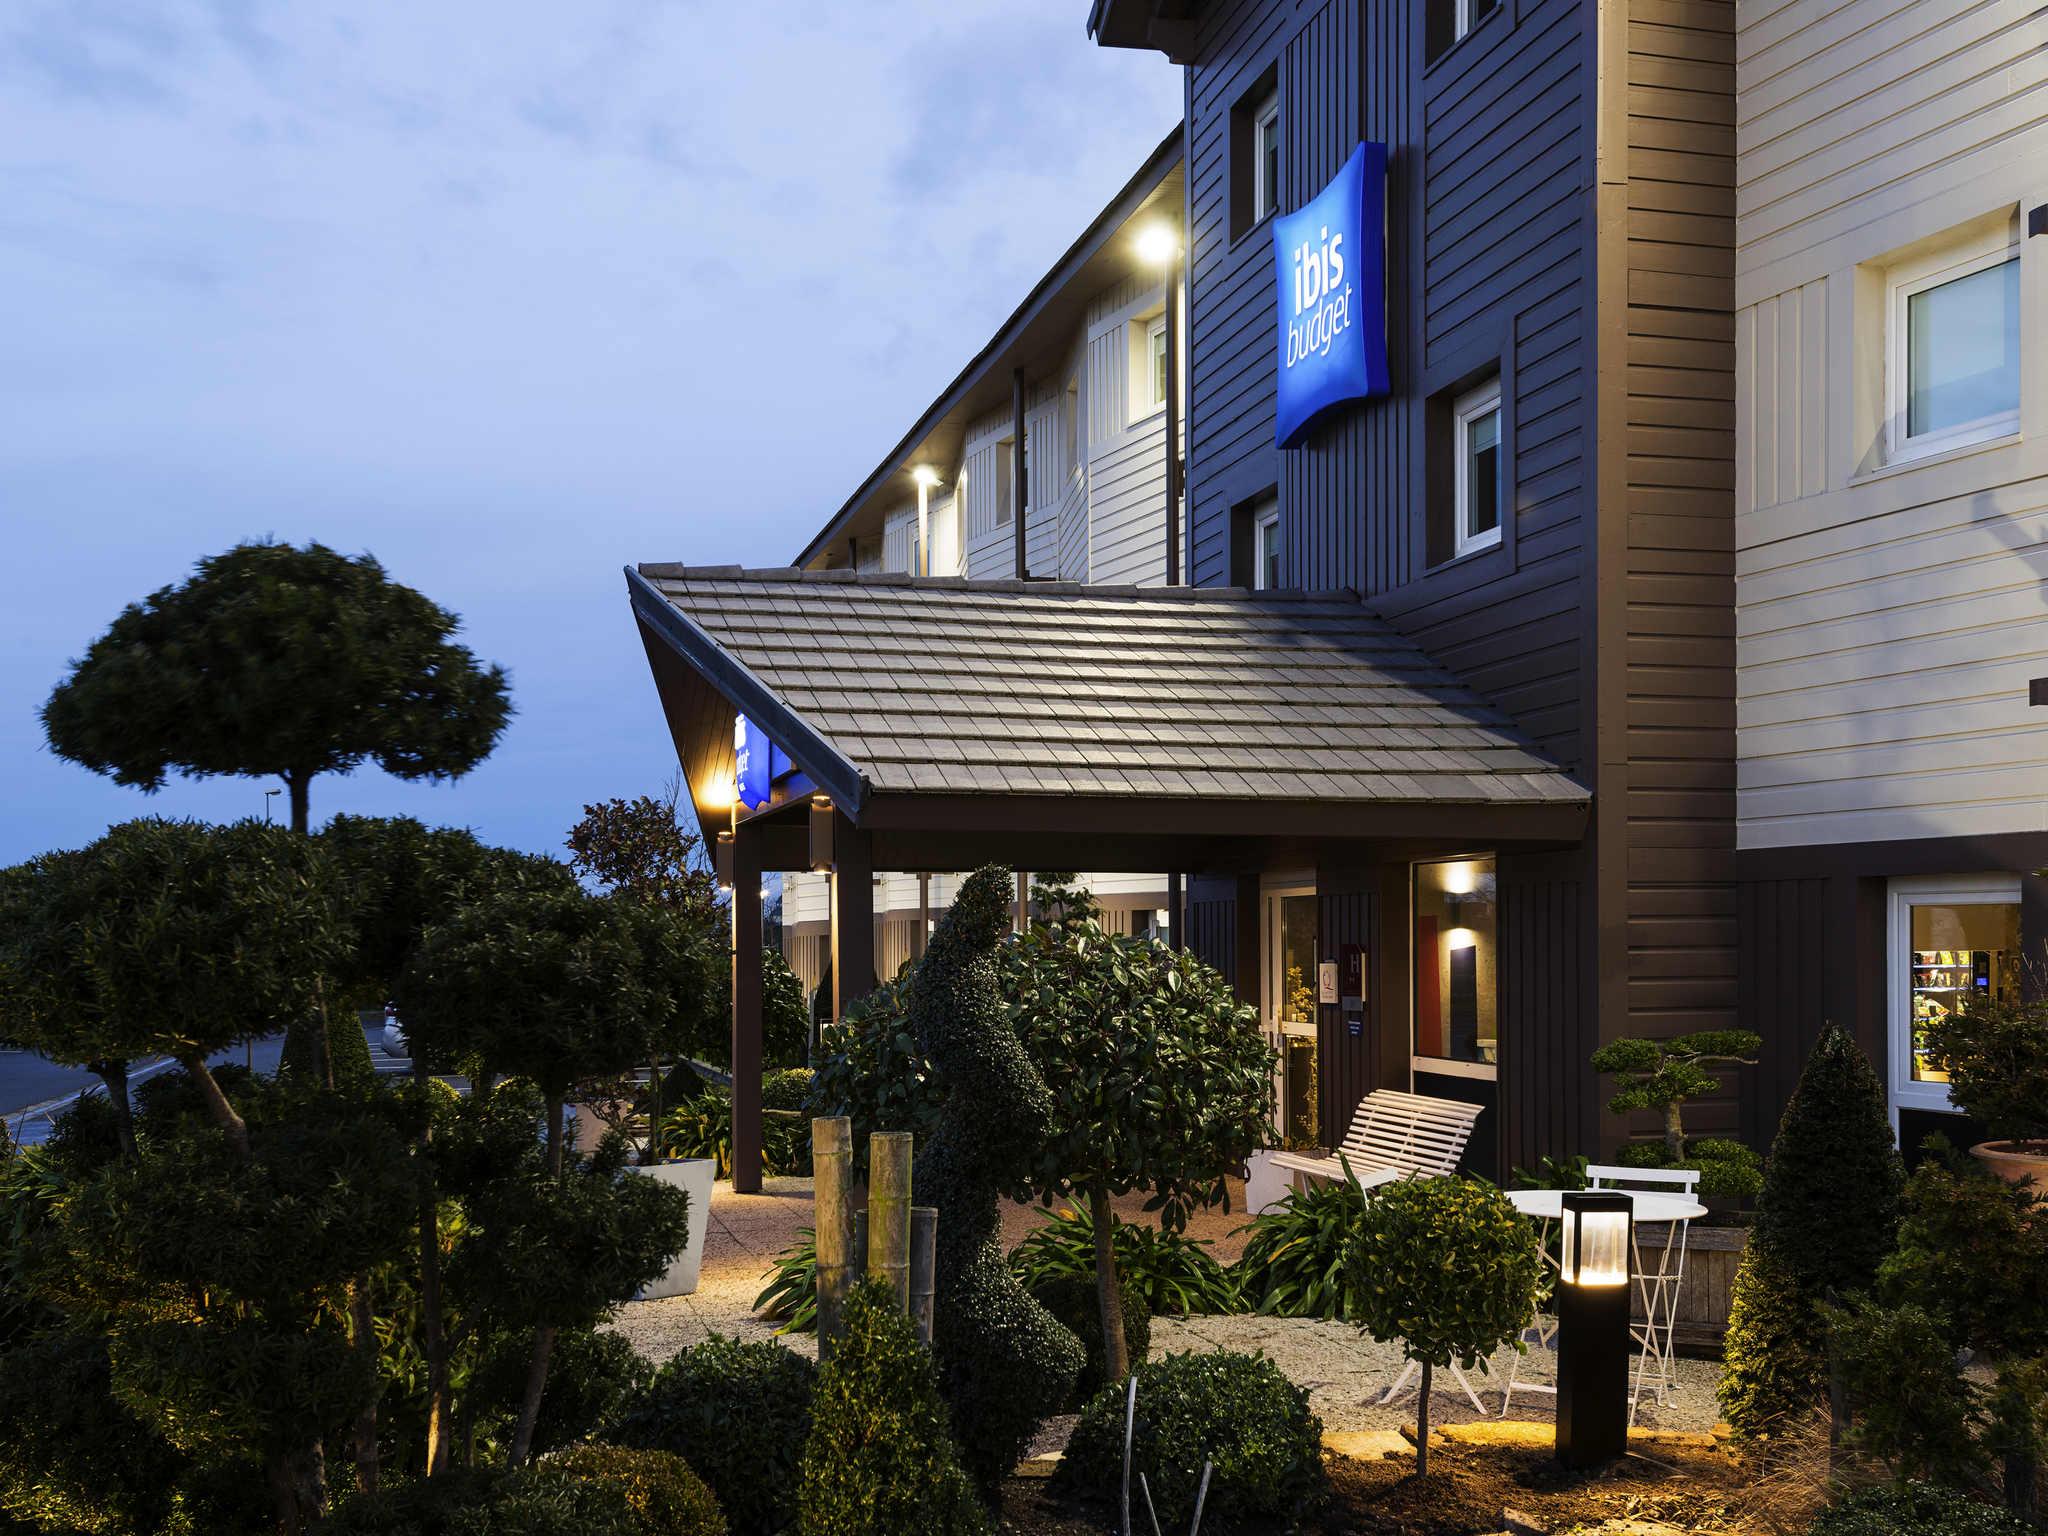 Hotel – ibis budget Cabourg Dives Sur Mer